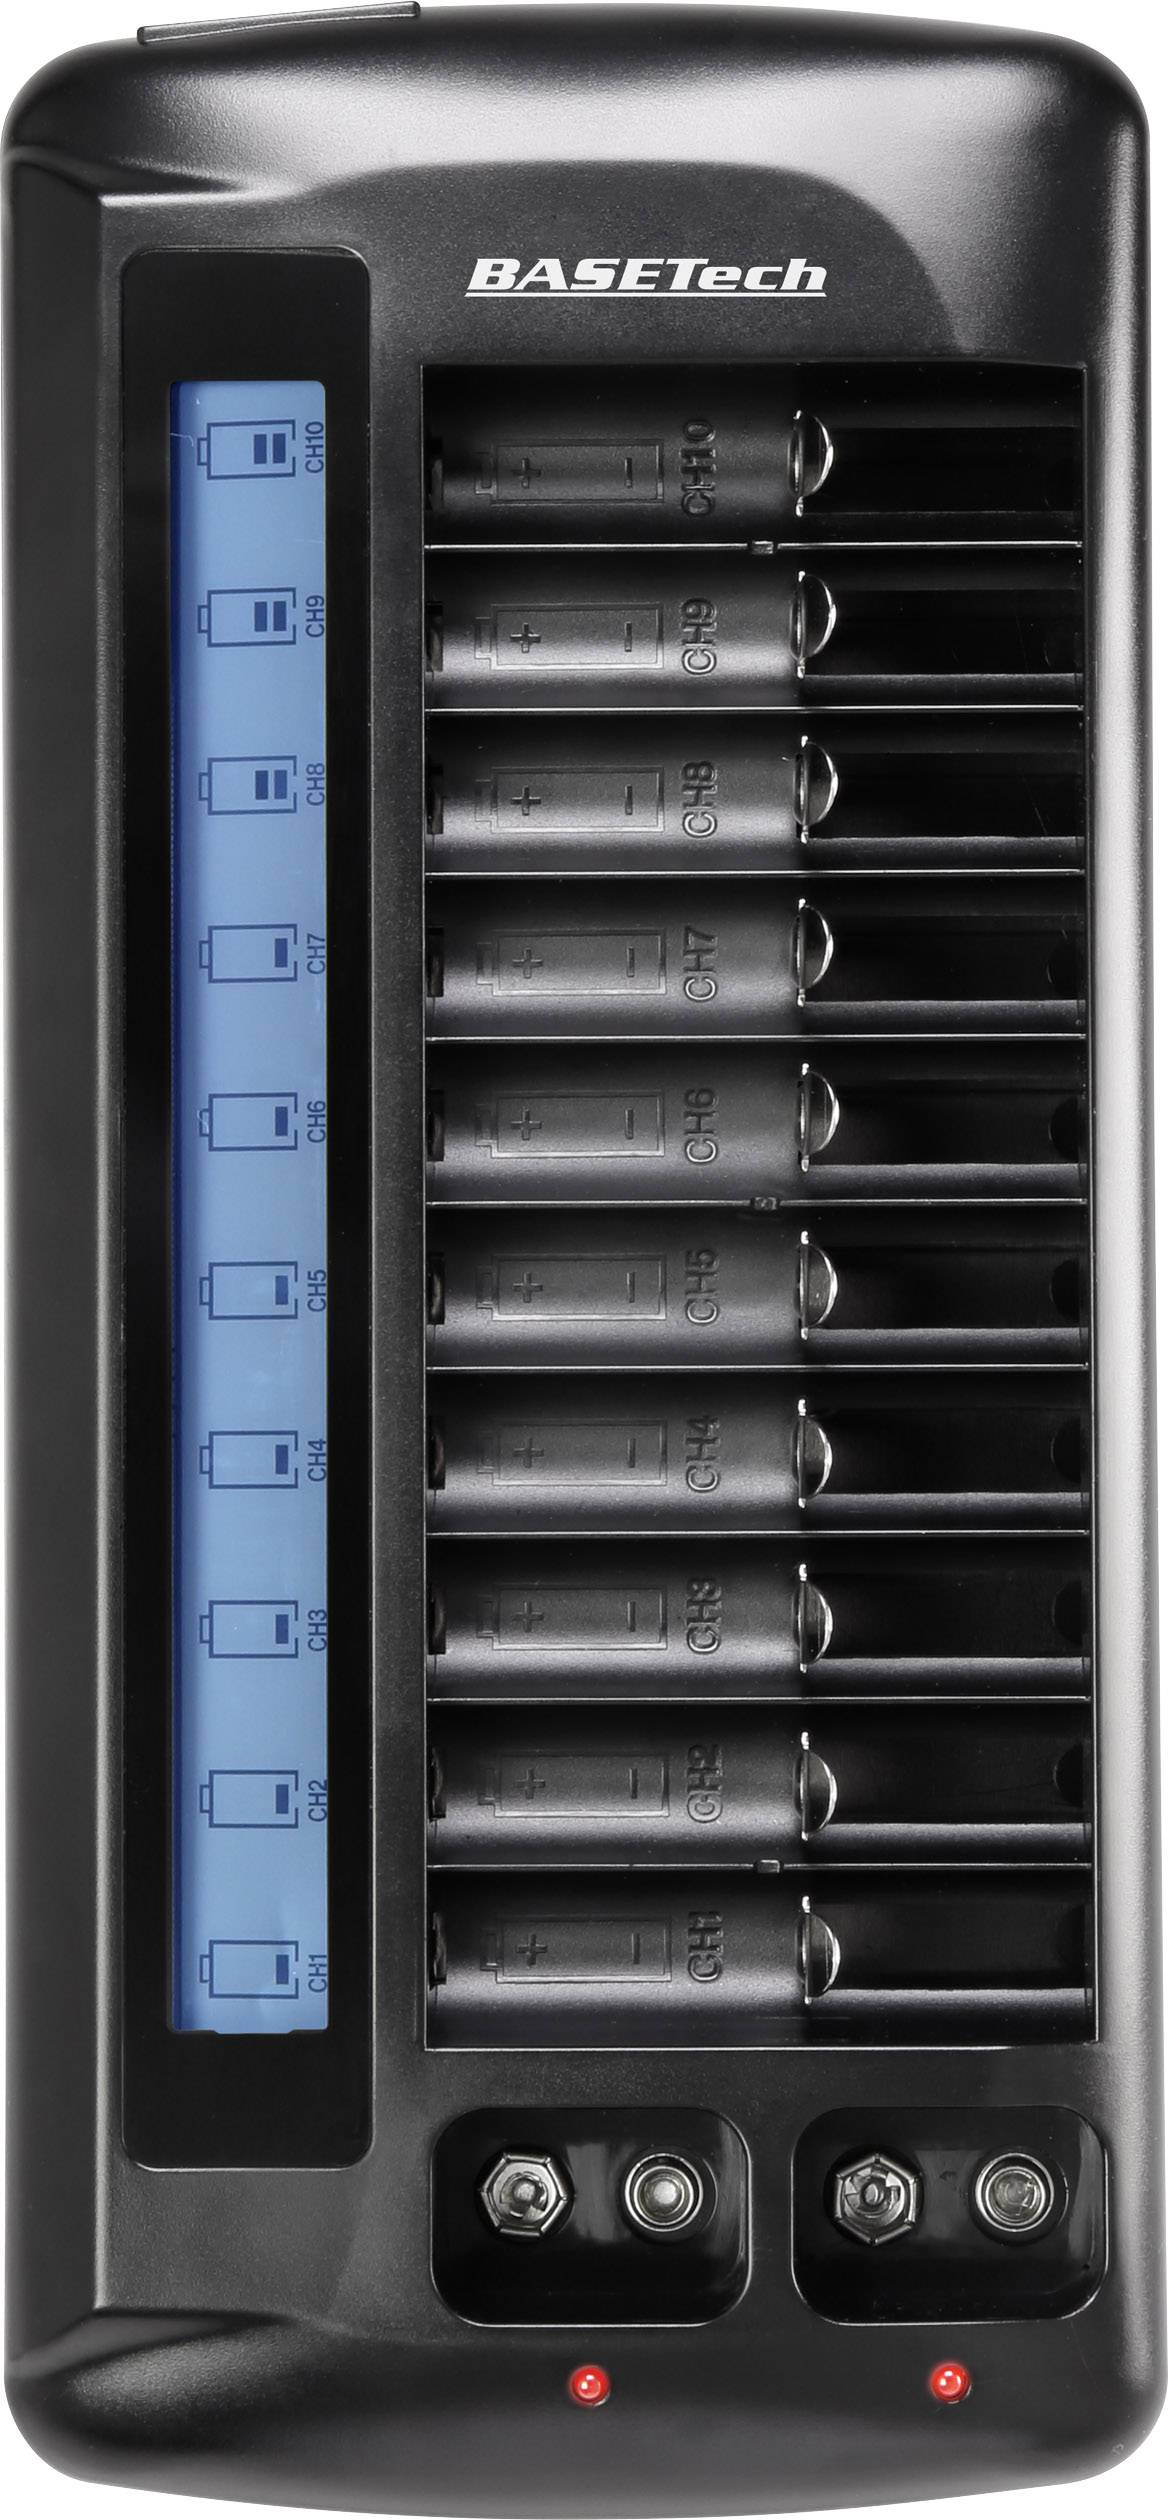 Nabíječka akumulátorů Basetech BTL-14 pro aklumulátory AAA, AA, 9 V